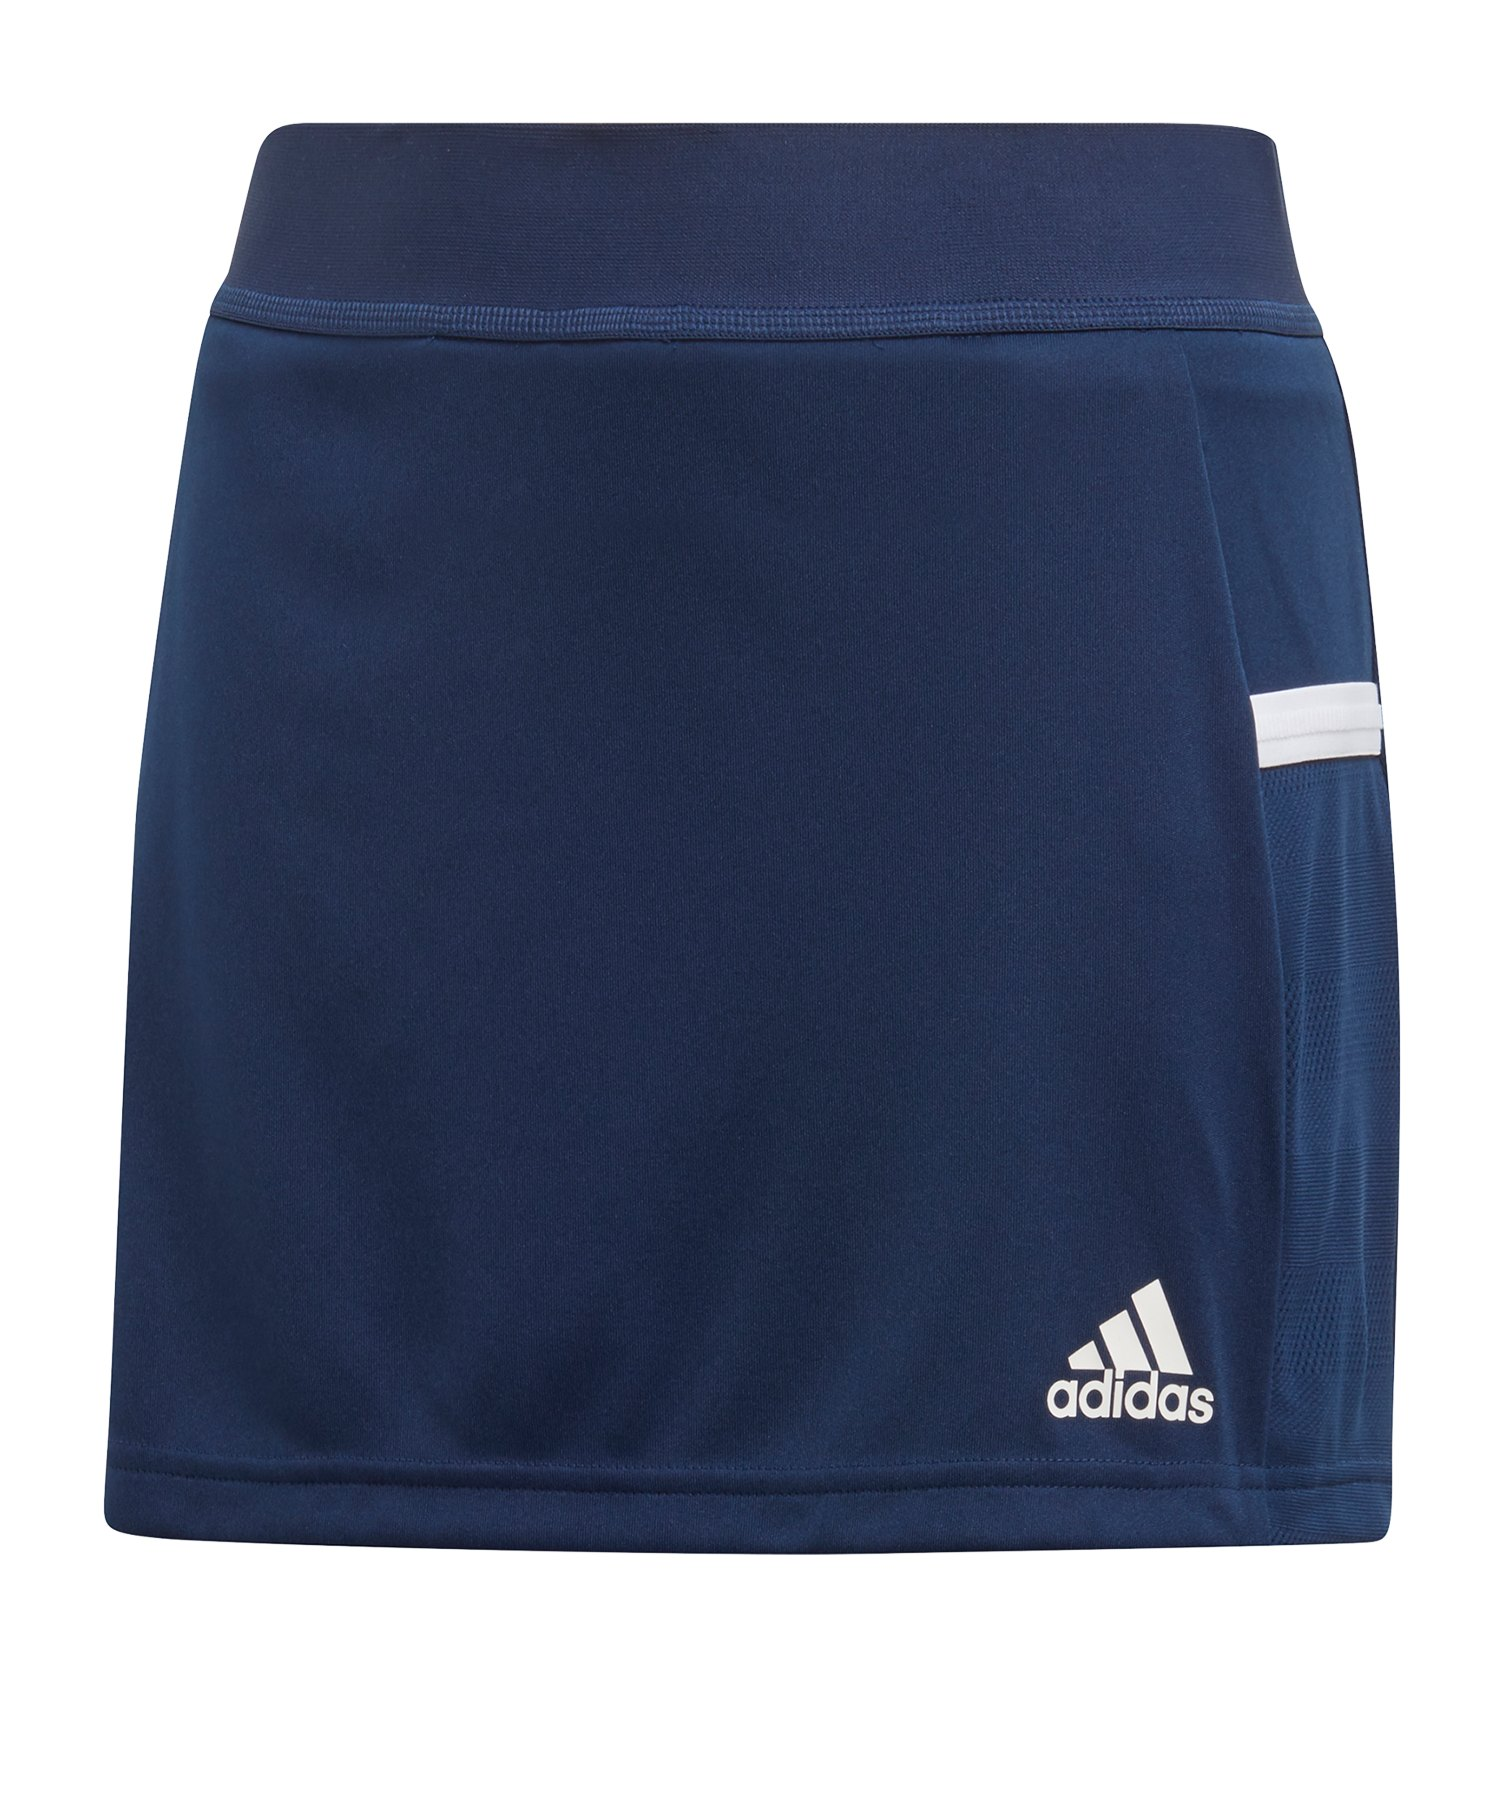 adidas Team 19 Skirt Rock Kids Blau Weiss - blau